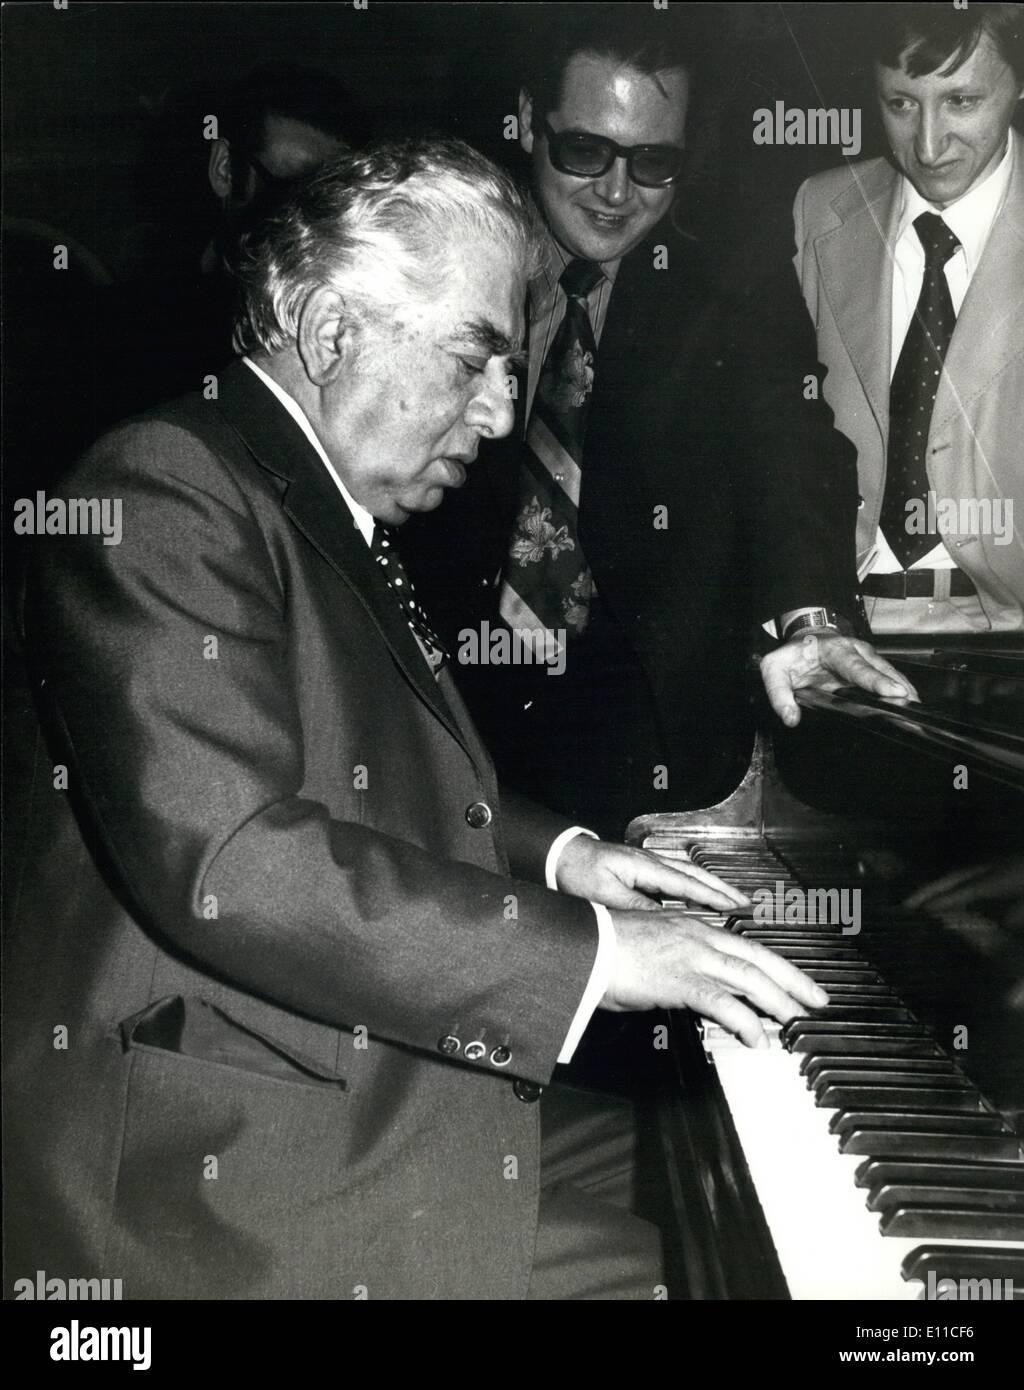 1 Januar 1977 Russischen Komponisten Aram Chatschaturjan In